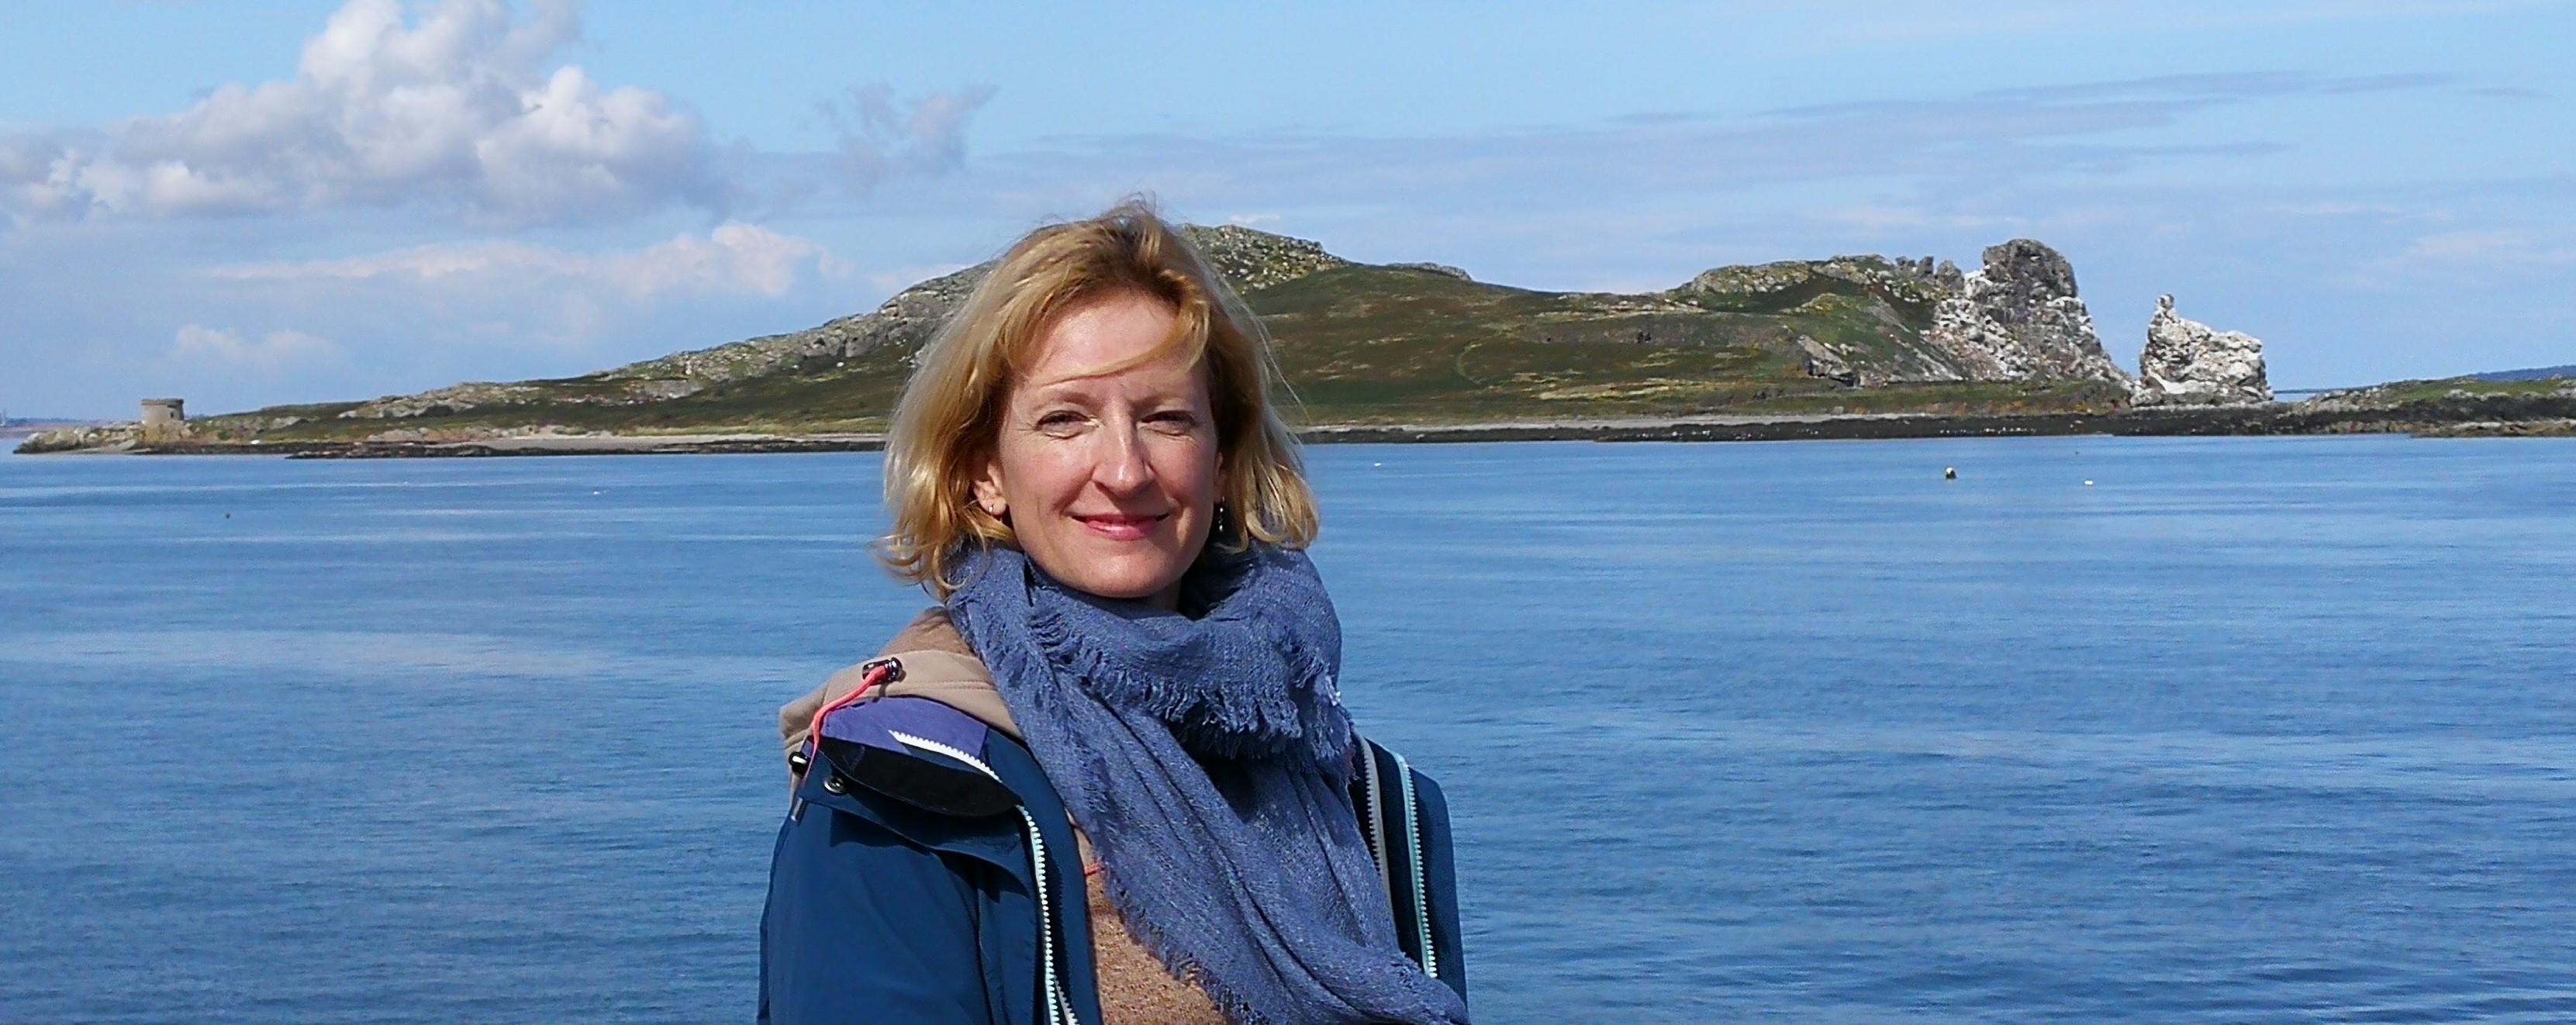 Melanie Rentmeister